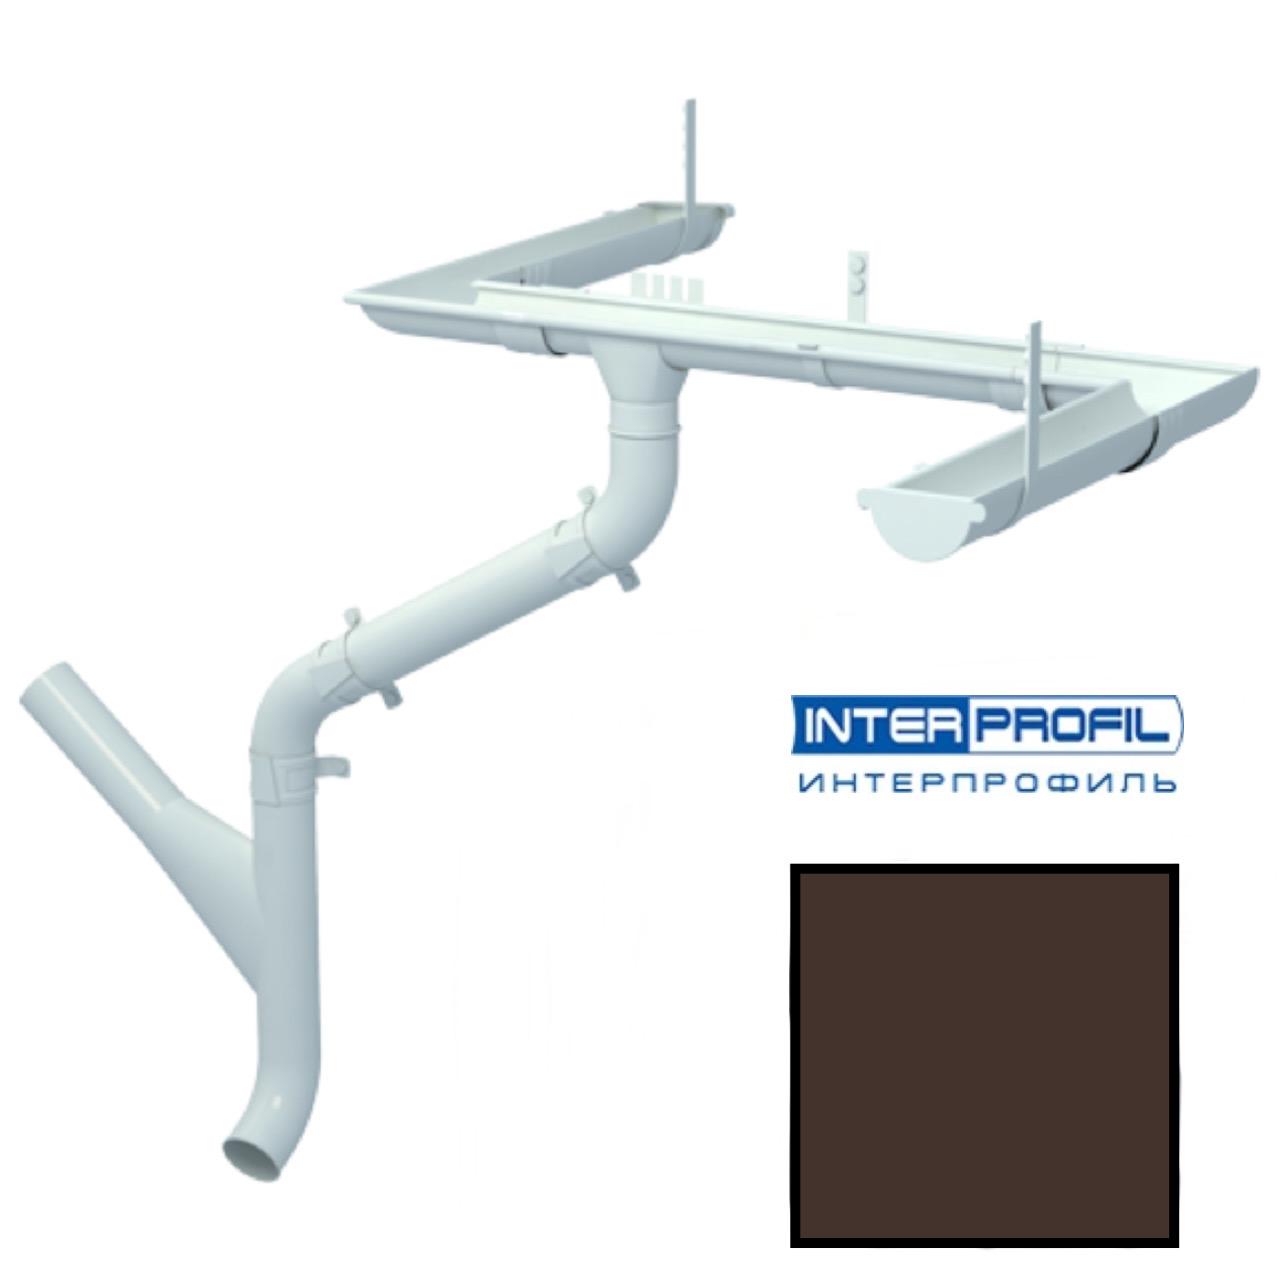 Металлический водосток Interprofil 125/90 RAL 8017 (шоколад) (Гранит)